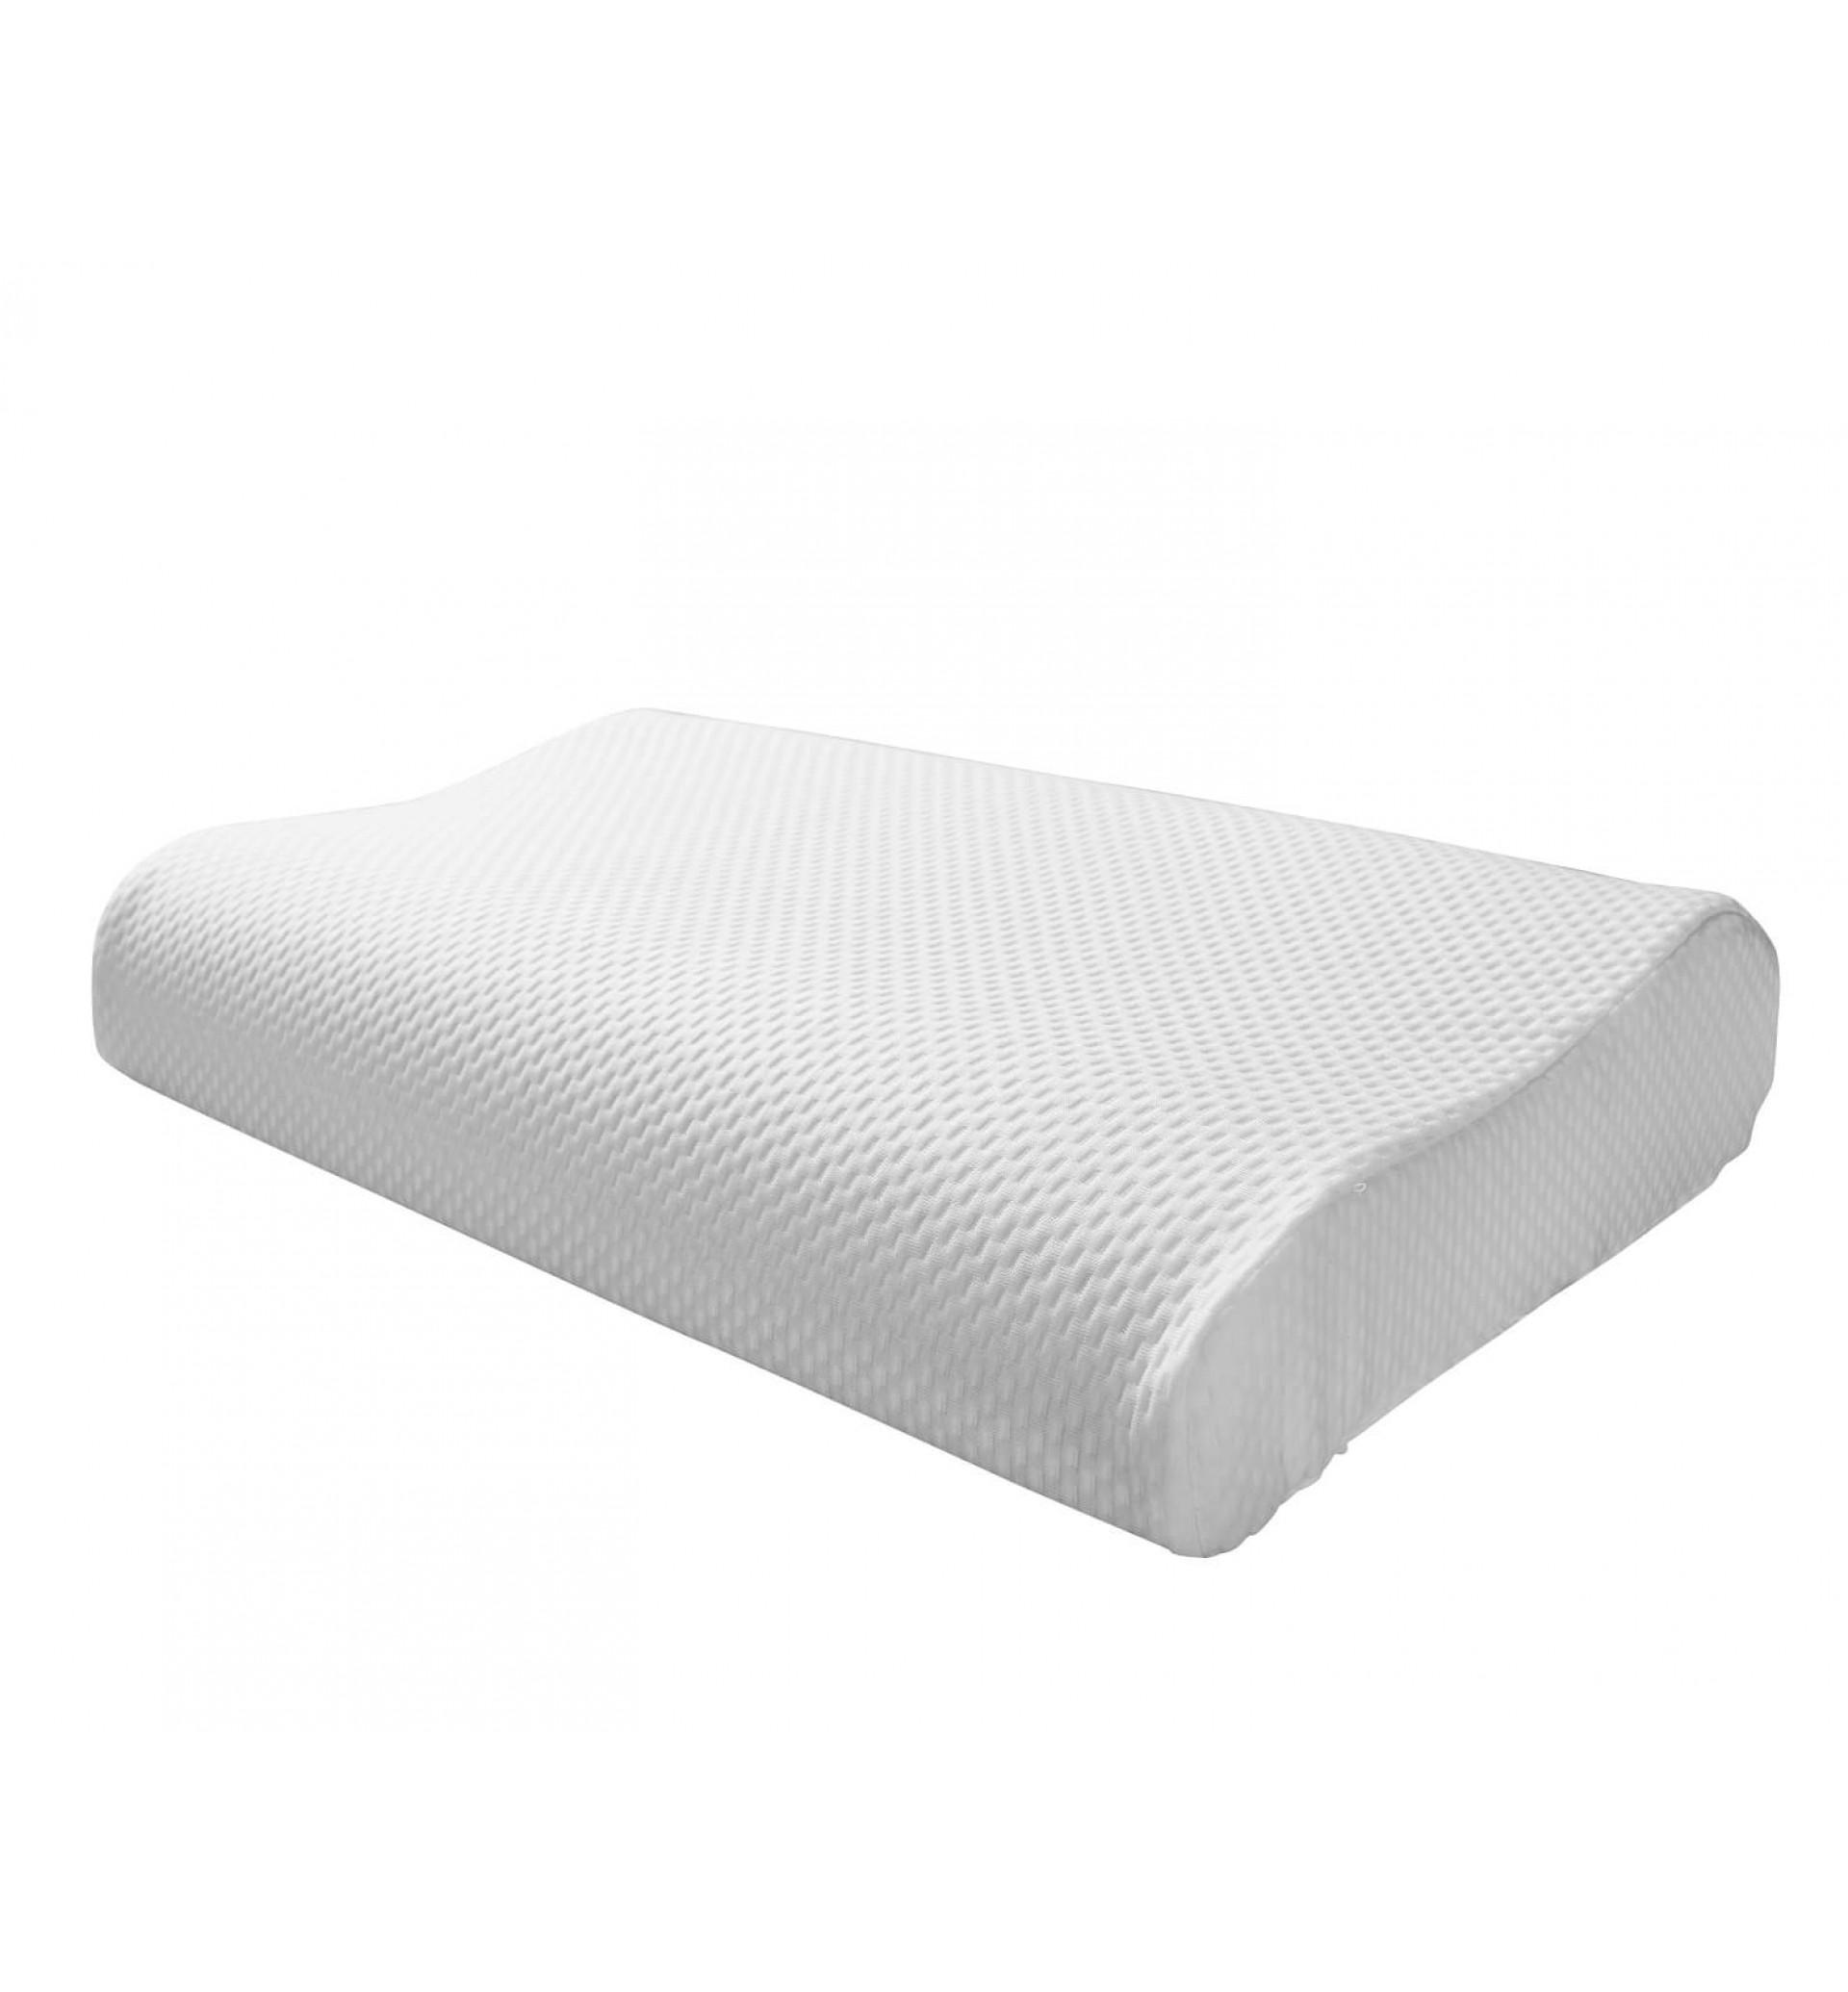 RUBBERRY 100% Natural Latex Pillow (CONTOUR)